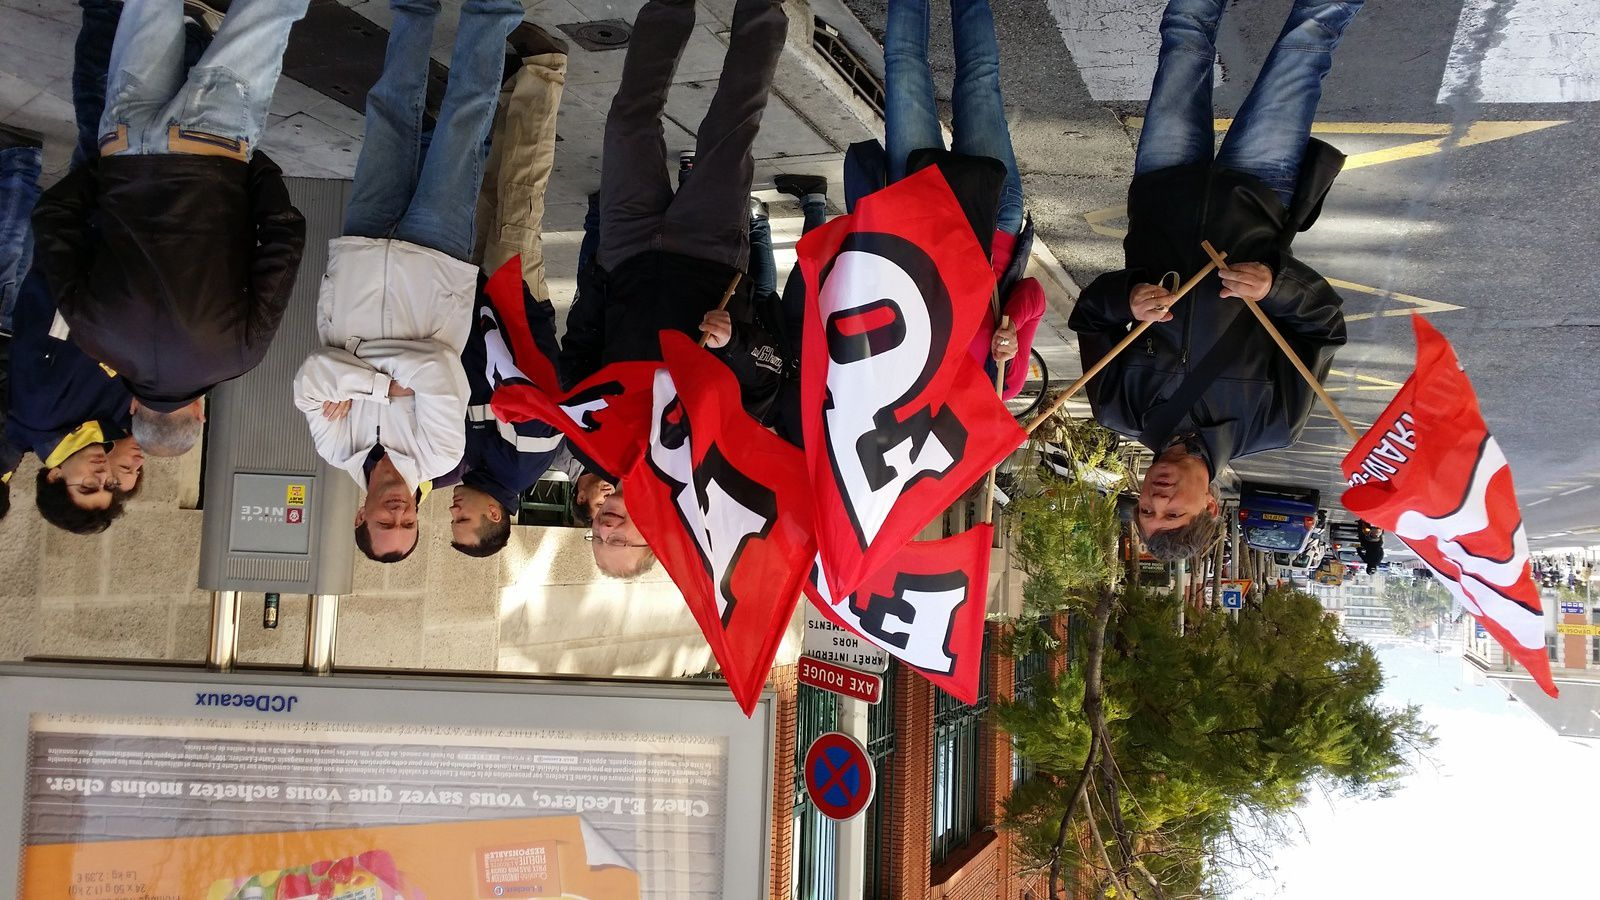 Aujourd'hui 17 mars 2014 devant la DOTC avenue Thiers